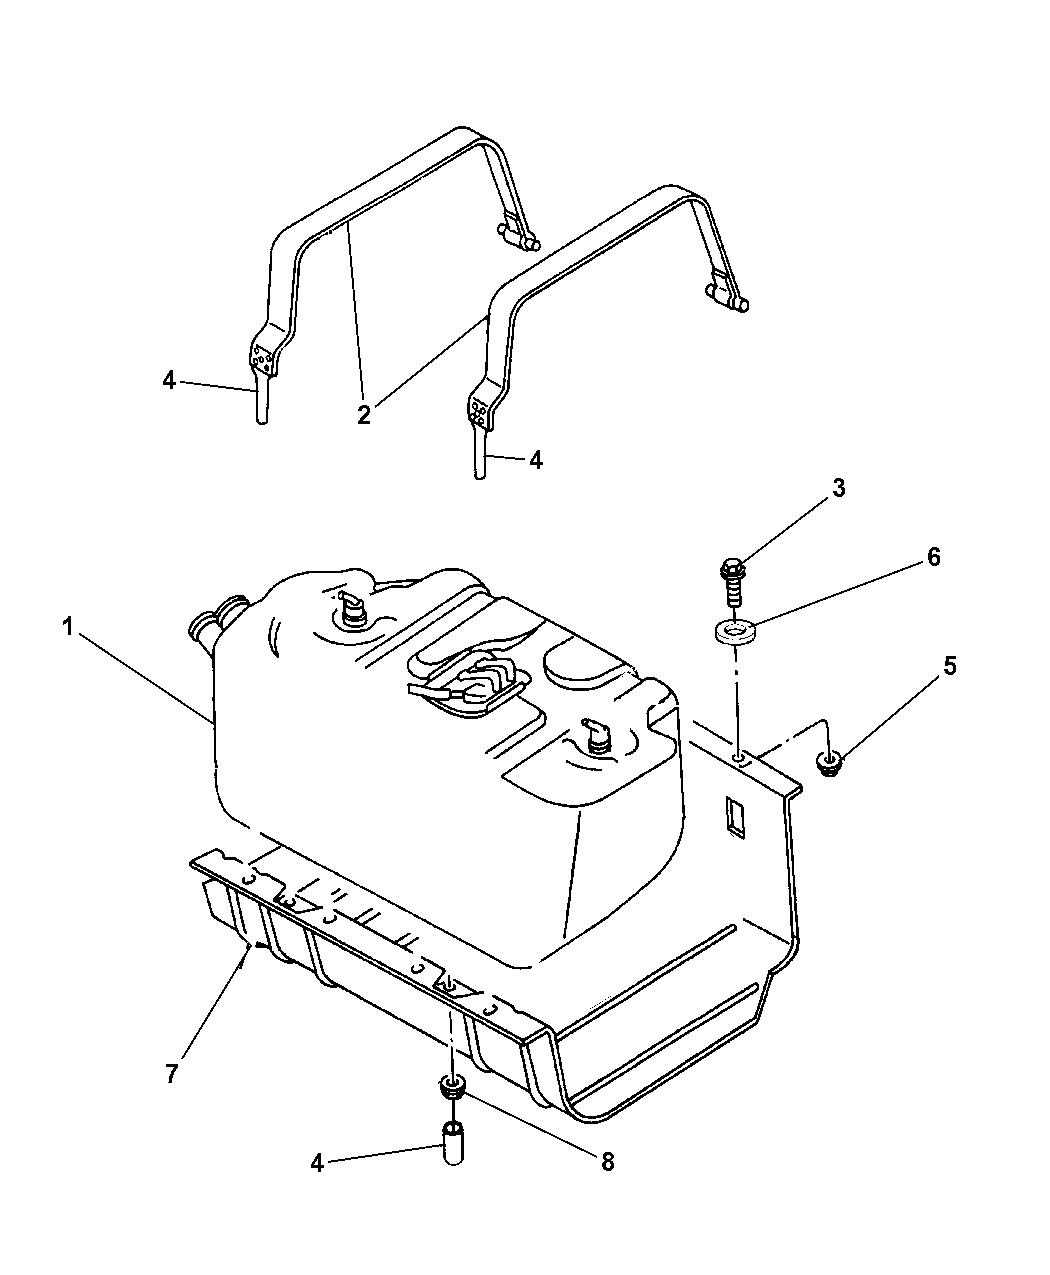 52059617ae - genuine mopar tank-fuel